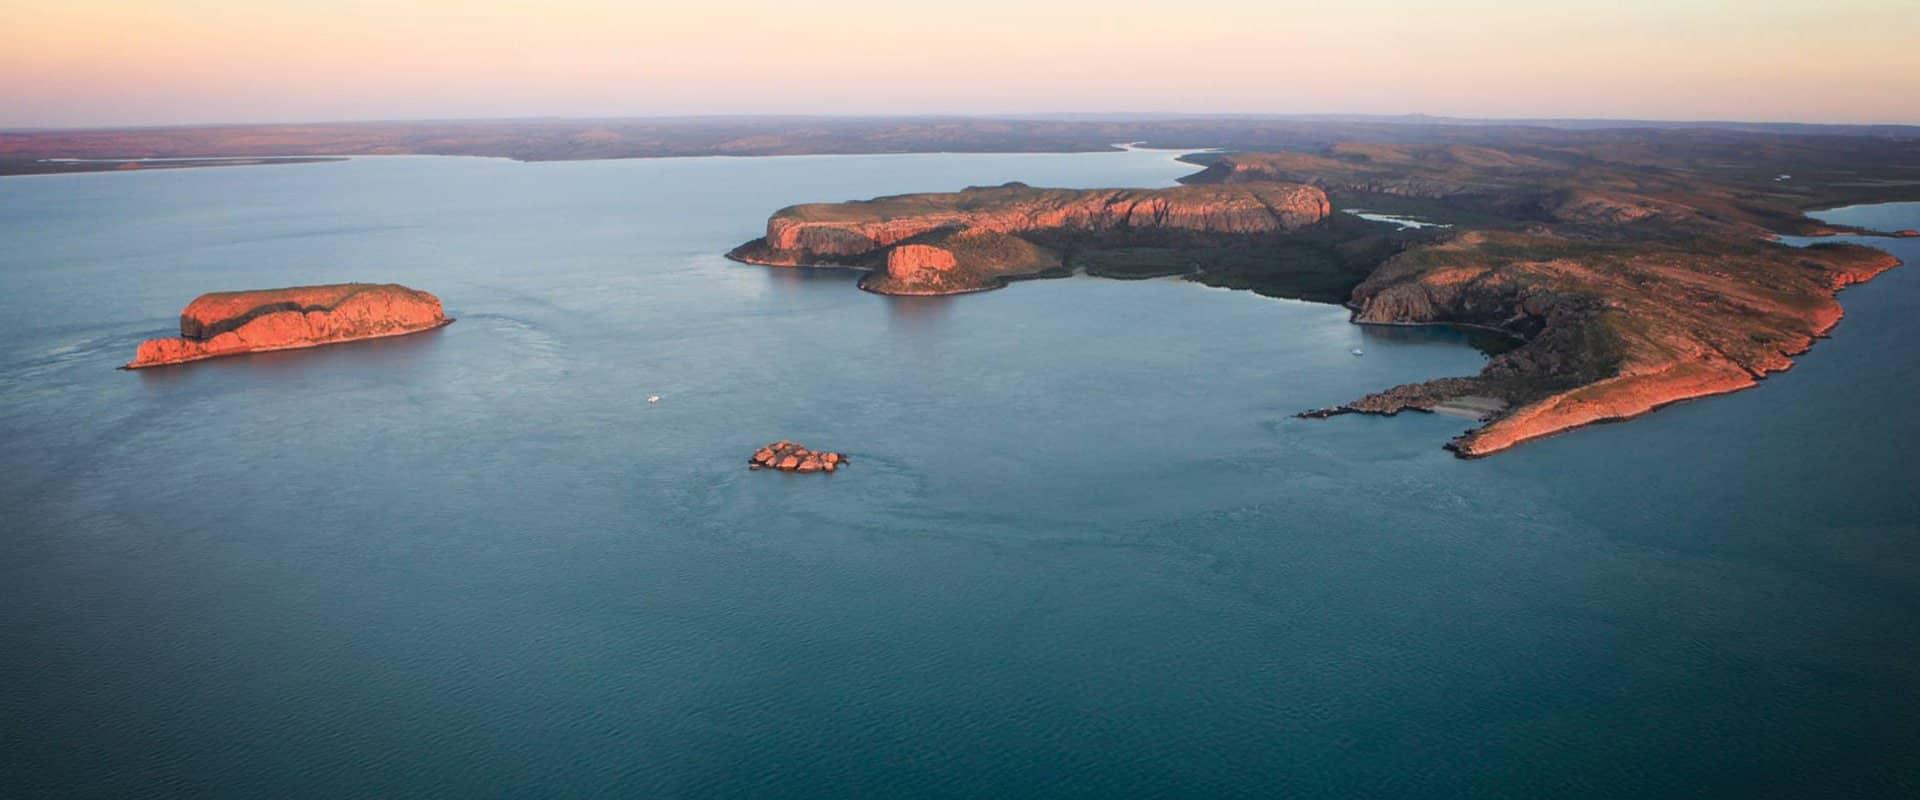 Kimberley Cruise header image